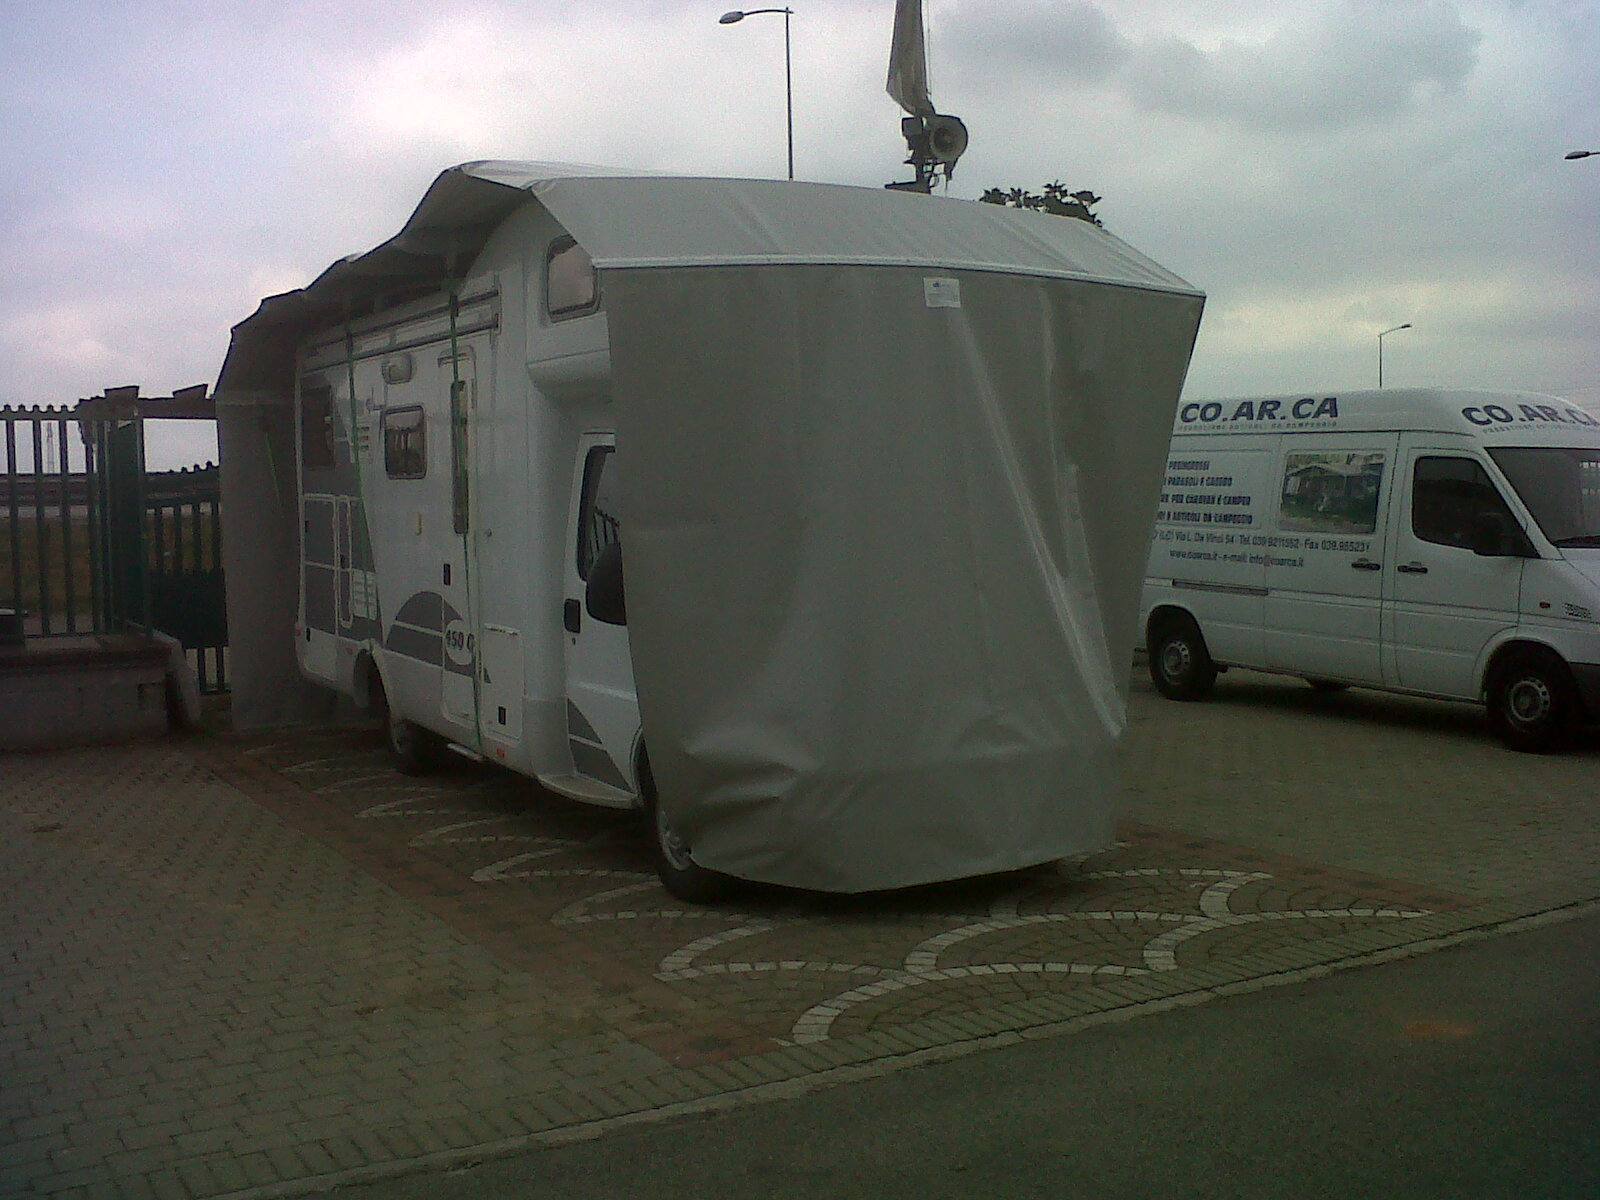 Copertura camper gonfiabile terminali antivento per for Tettoia per camper